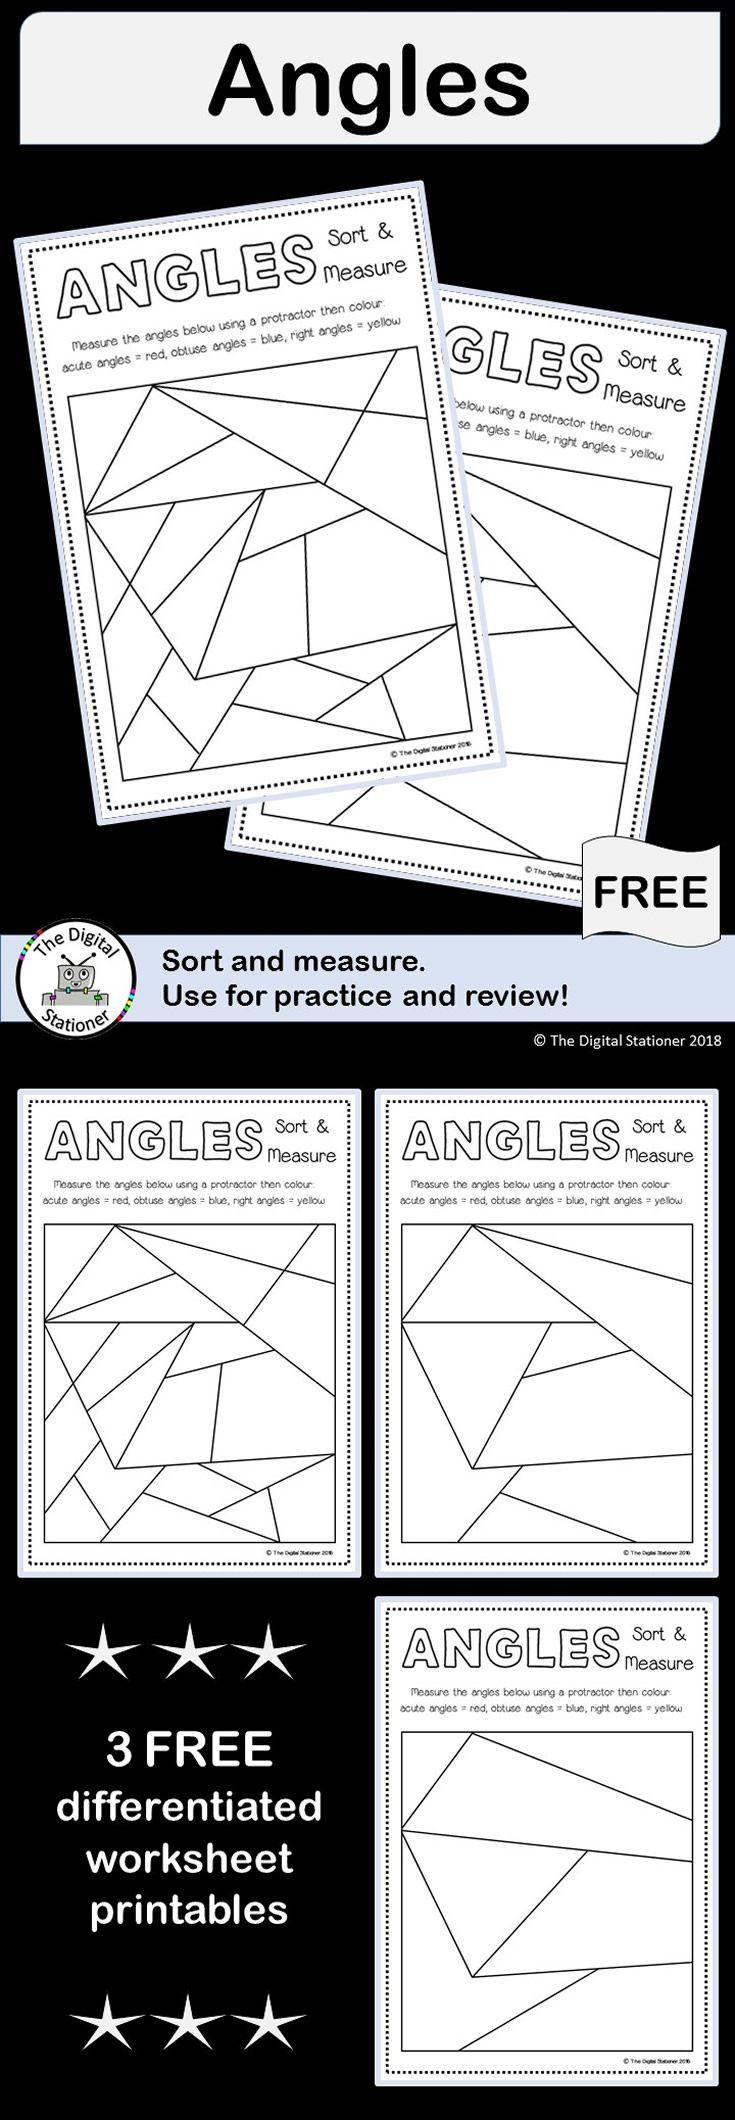 Pin by PrimaryStarsEducation on My FREEBIES! Educational